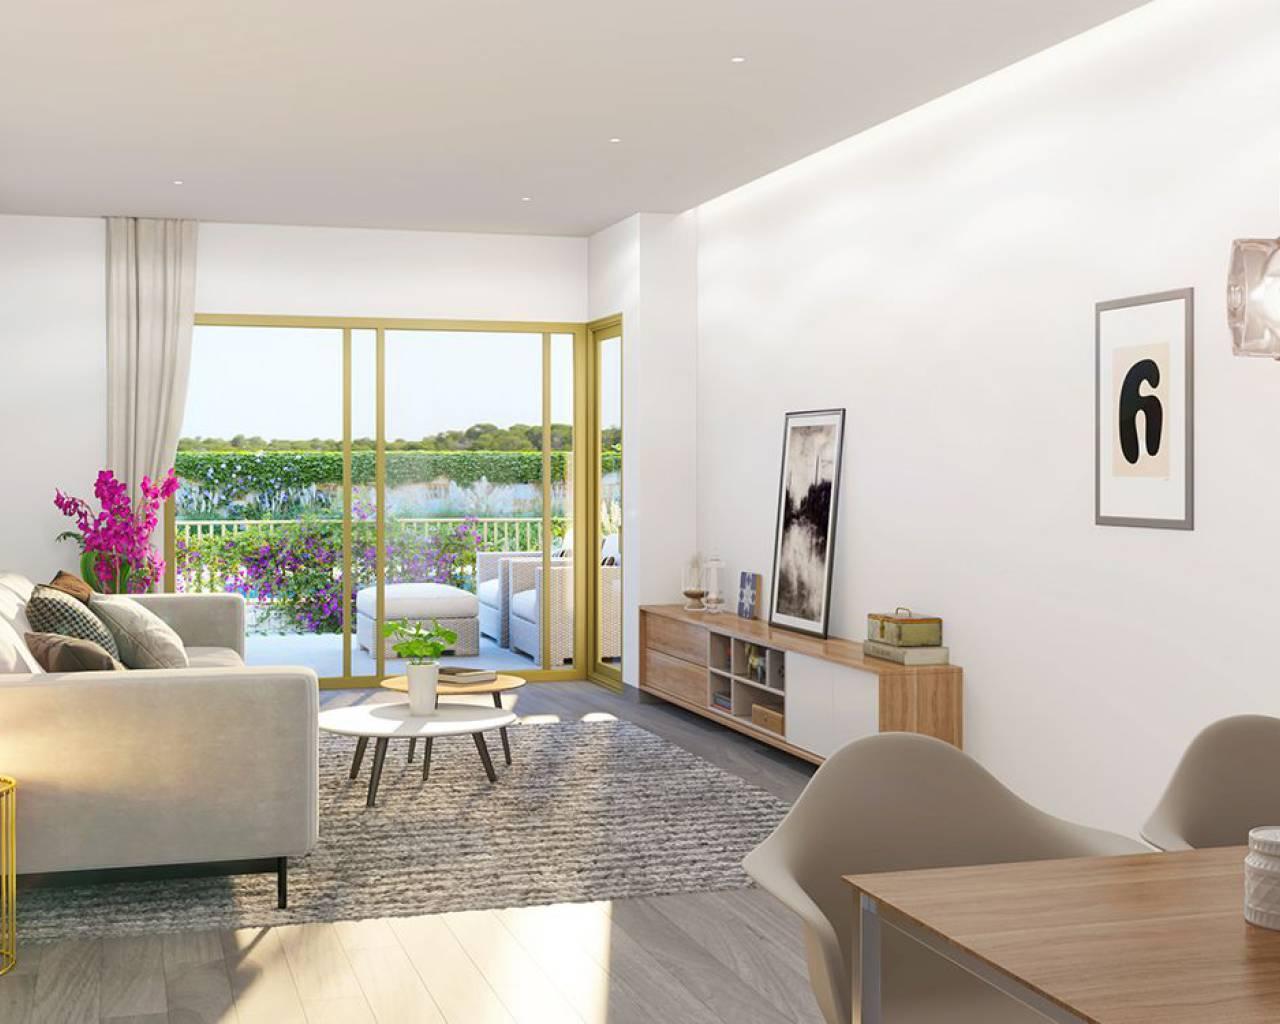 nieuwbouw-appartement-pilar-de-la-horadada_5795_xl